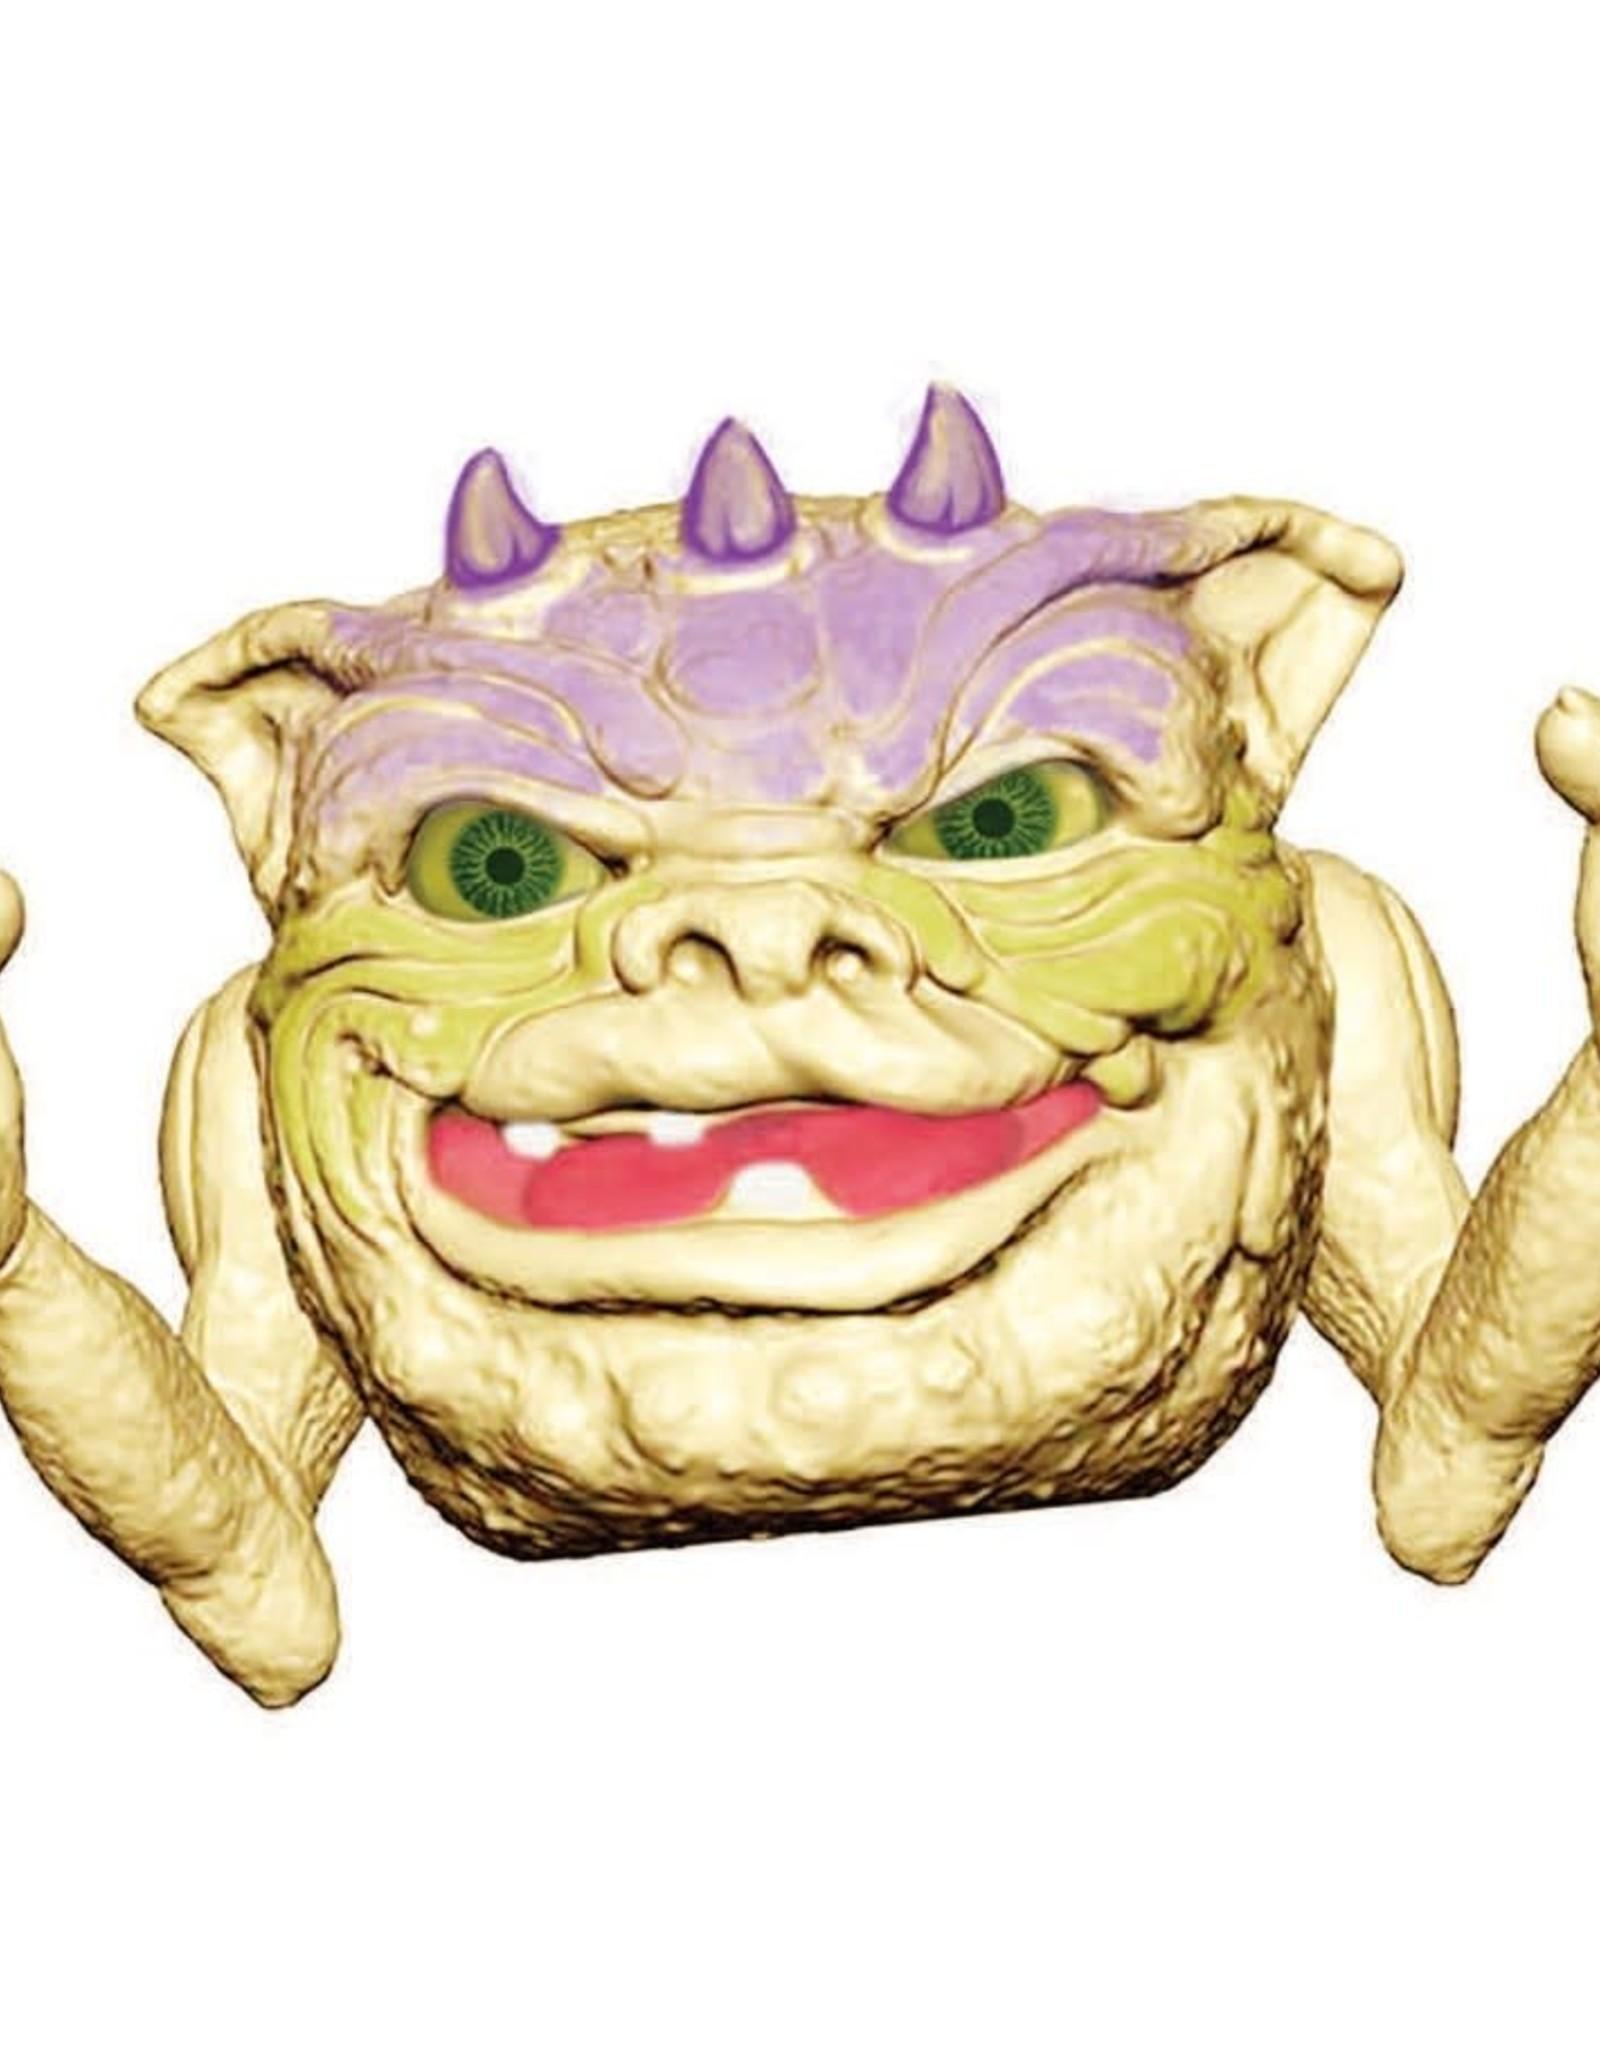 Triaction Toys Boglins: King Drool